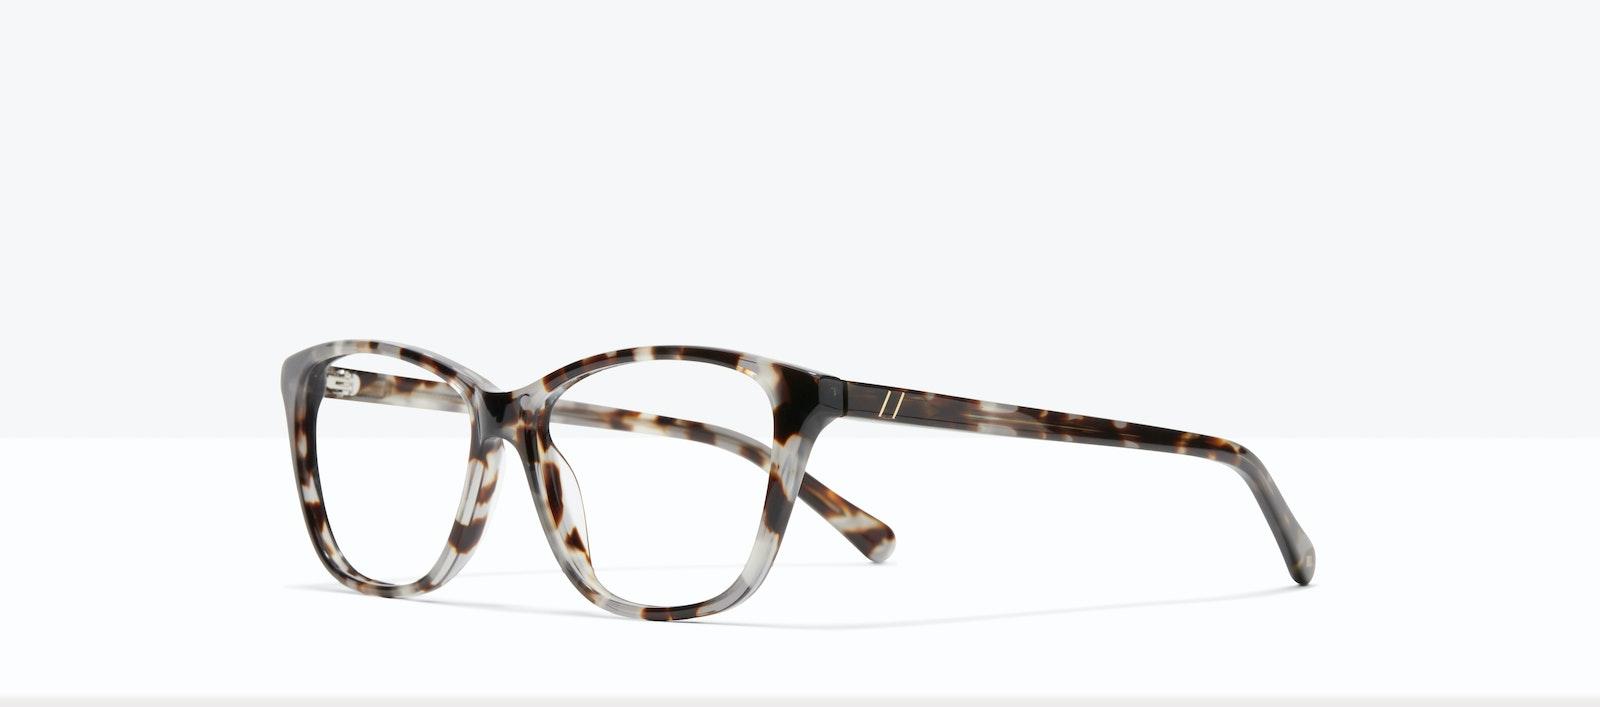 Affordable Fashion Glasses Cat Eye Rectangle Eyeglasses Women Myrtle M Blue Tort Tilt